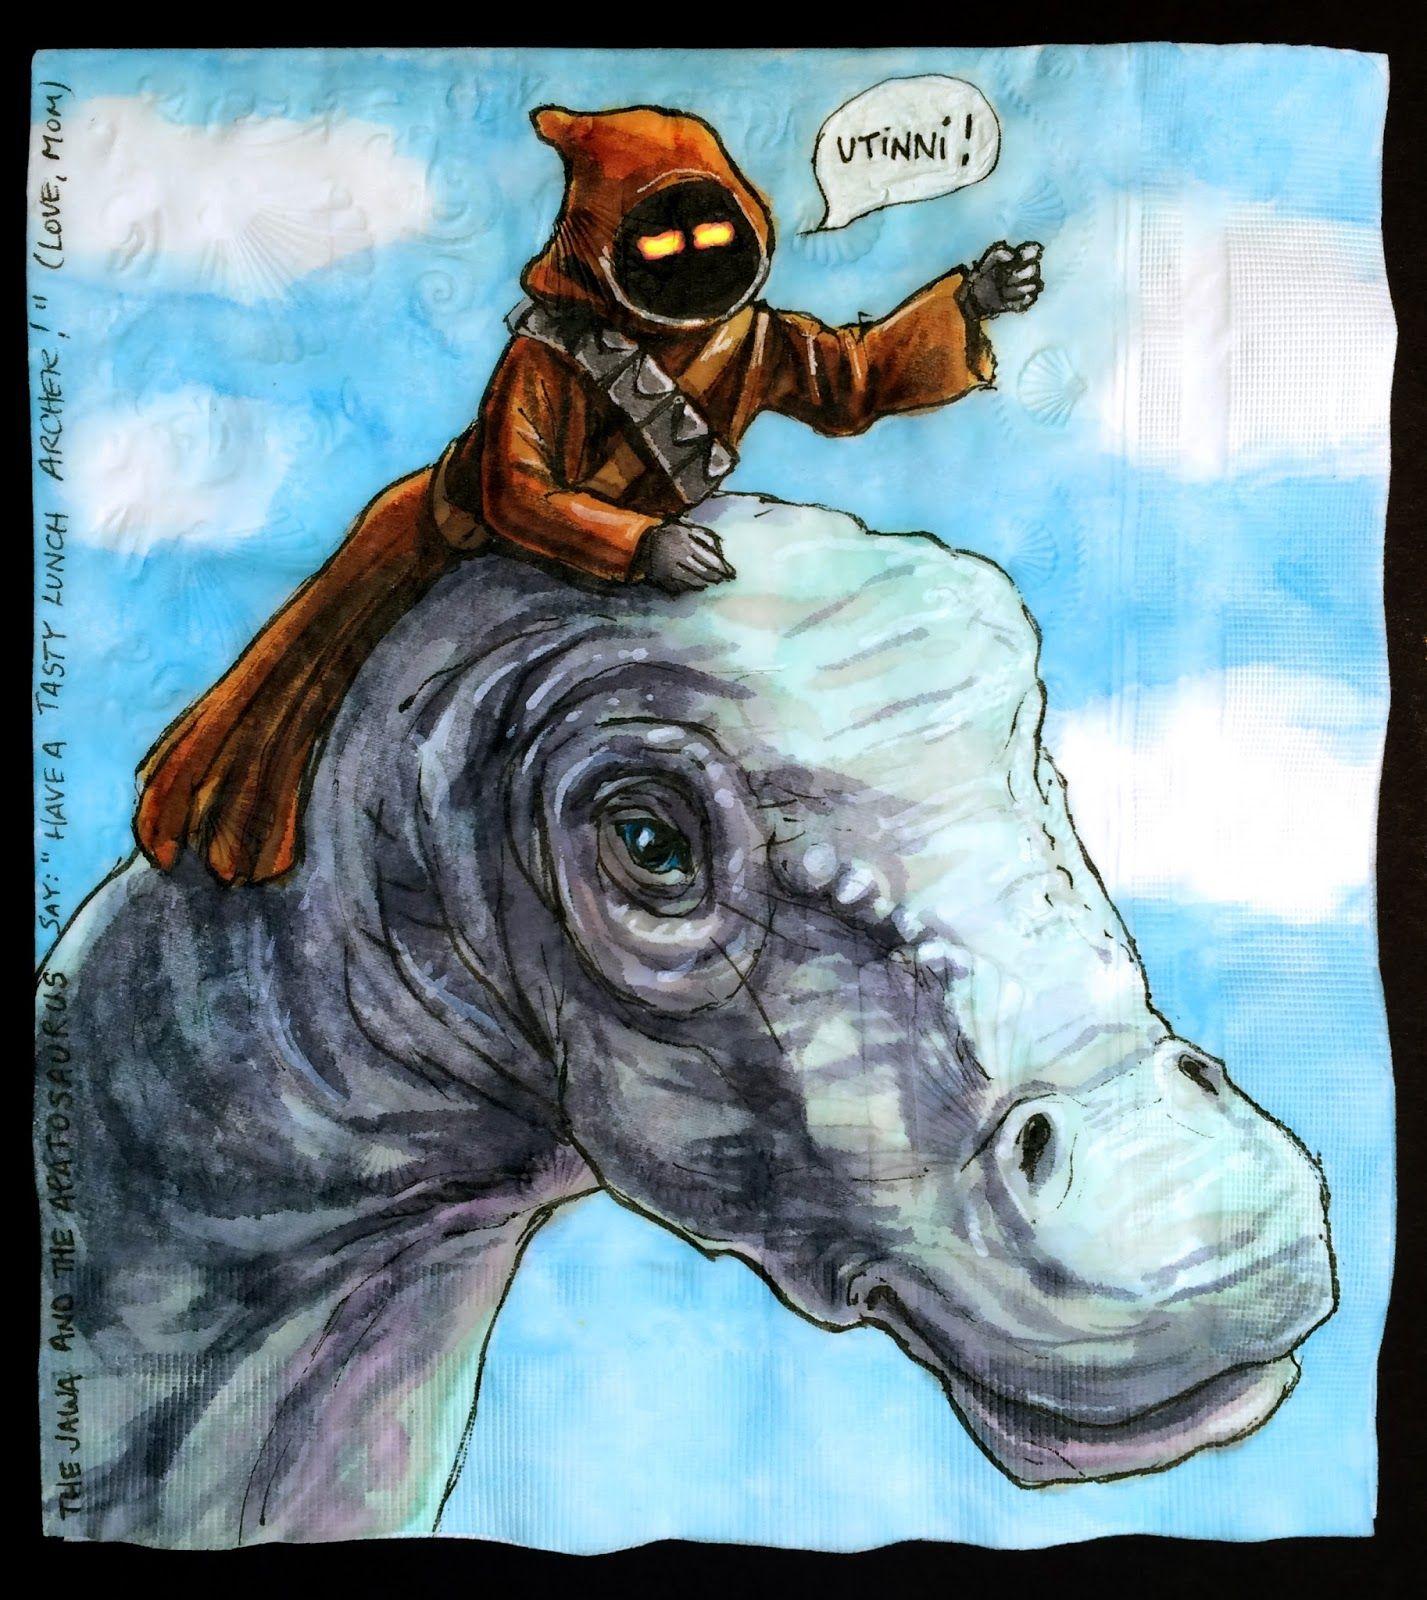 Star Wars Characters Ride Jurassic World Dinosaurs